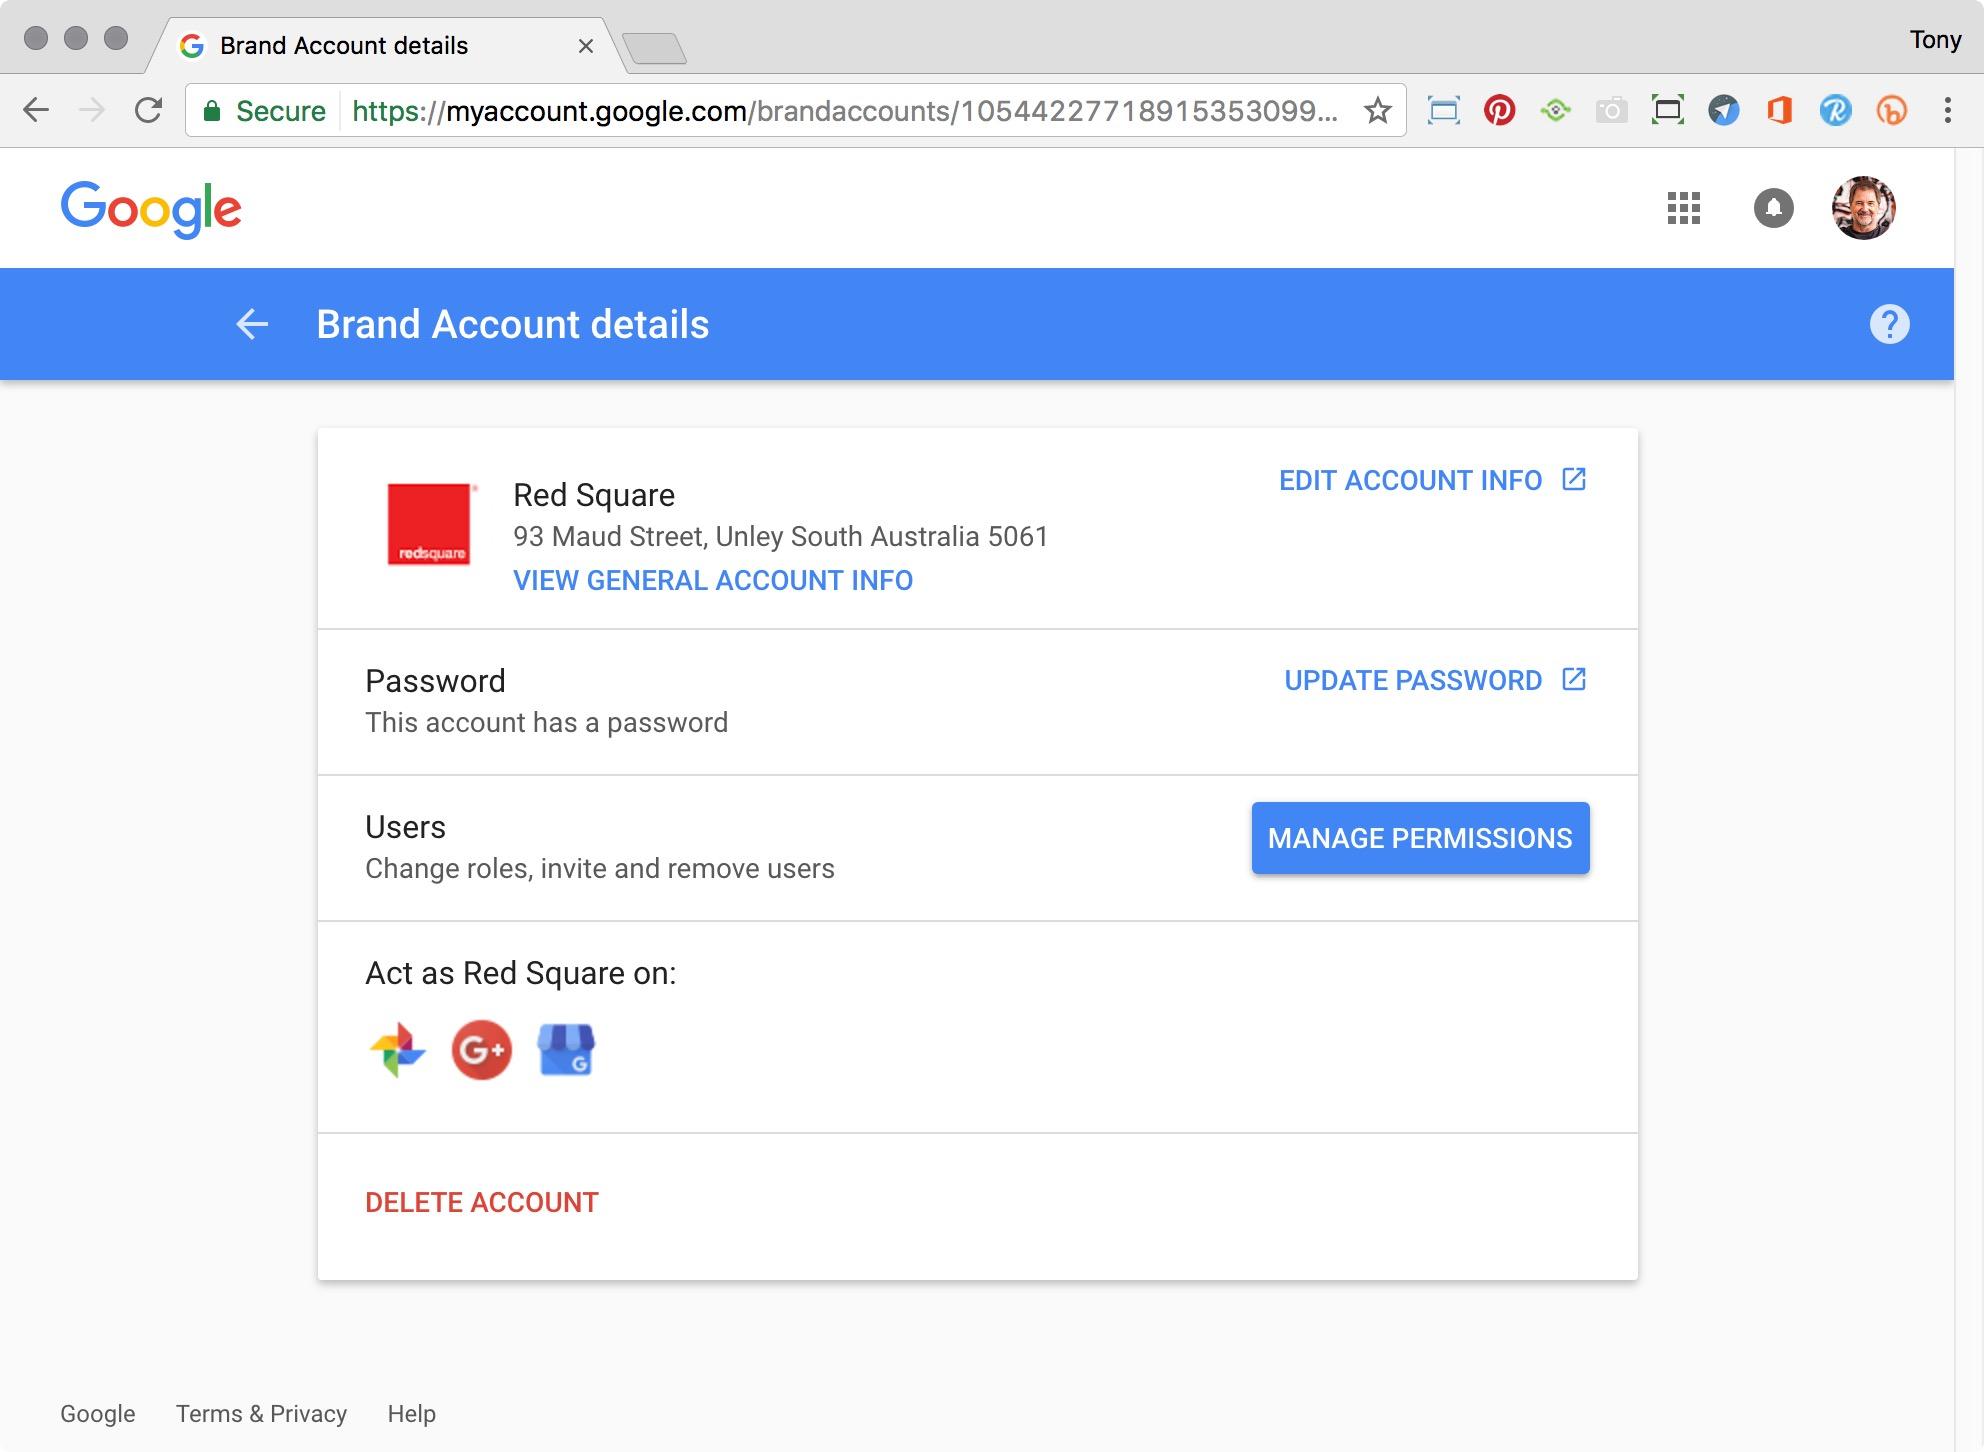 Google Brand Account details